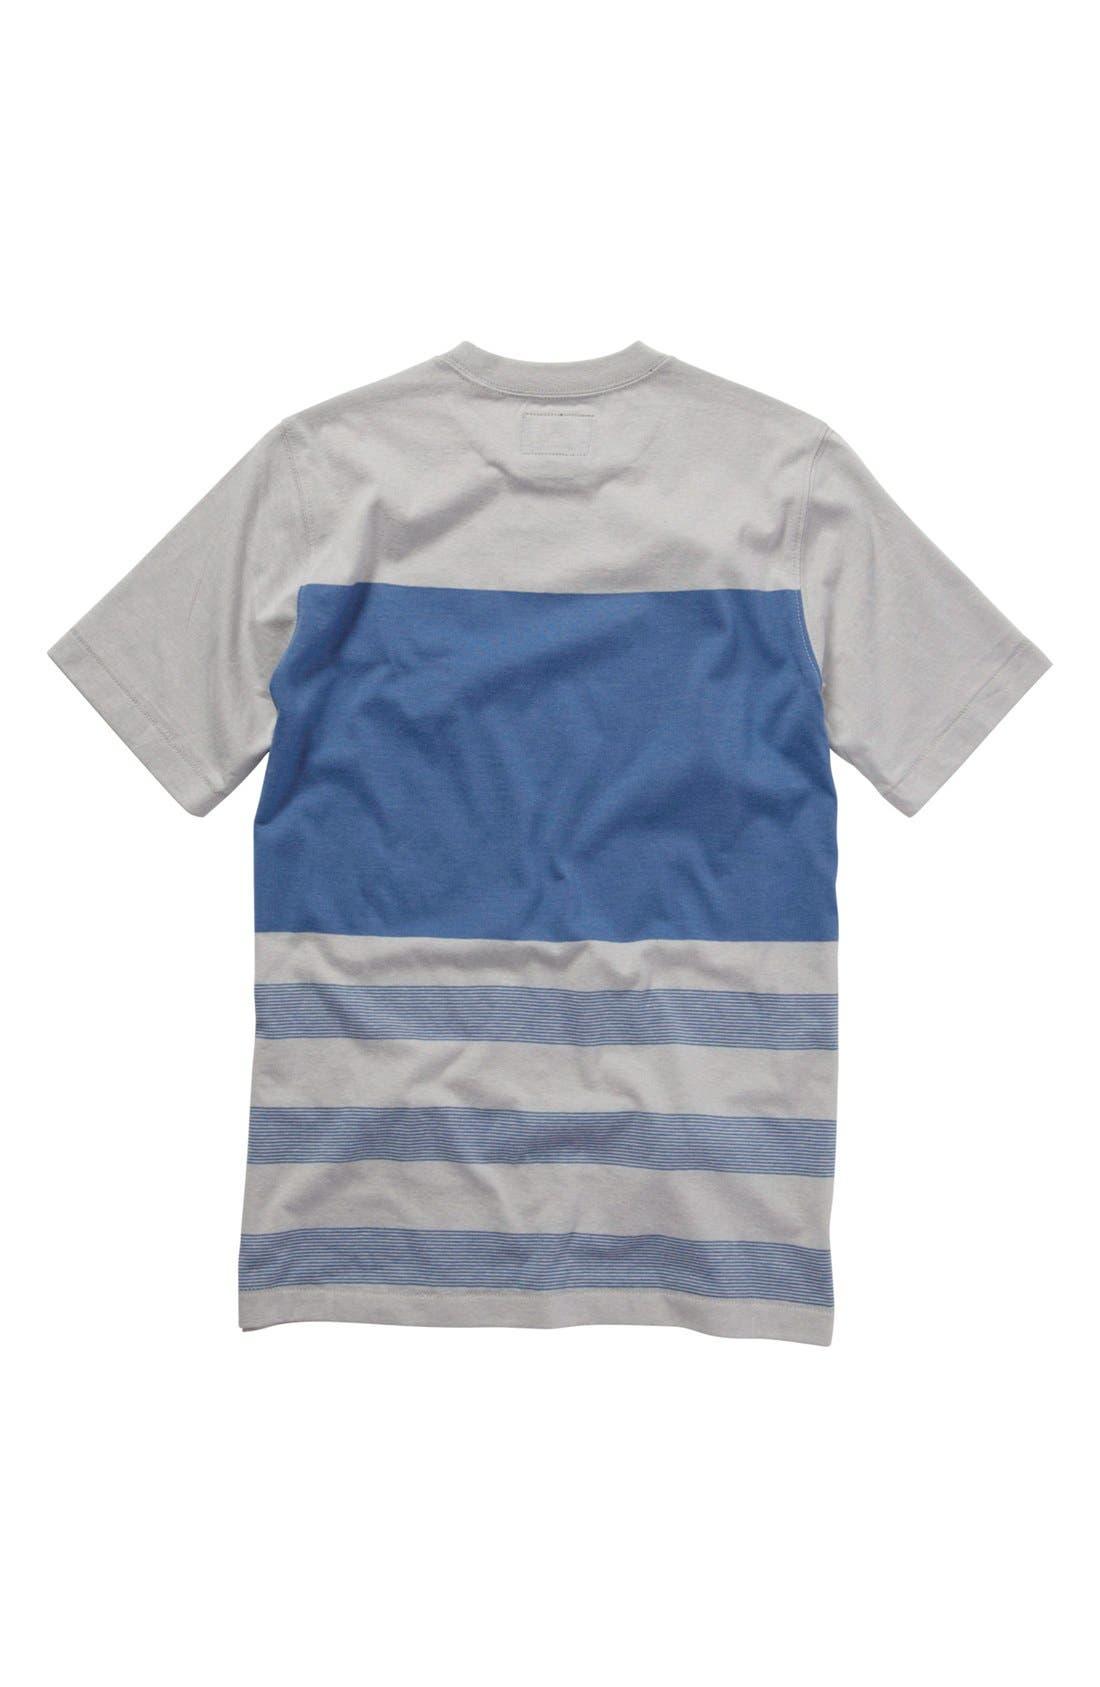 Alternate Image 2  - Quiksilver 'Migo' Short Sleeve T-Shirt (Little Boys & Big Boys)